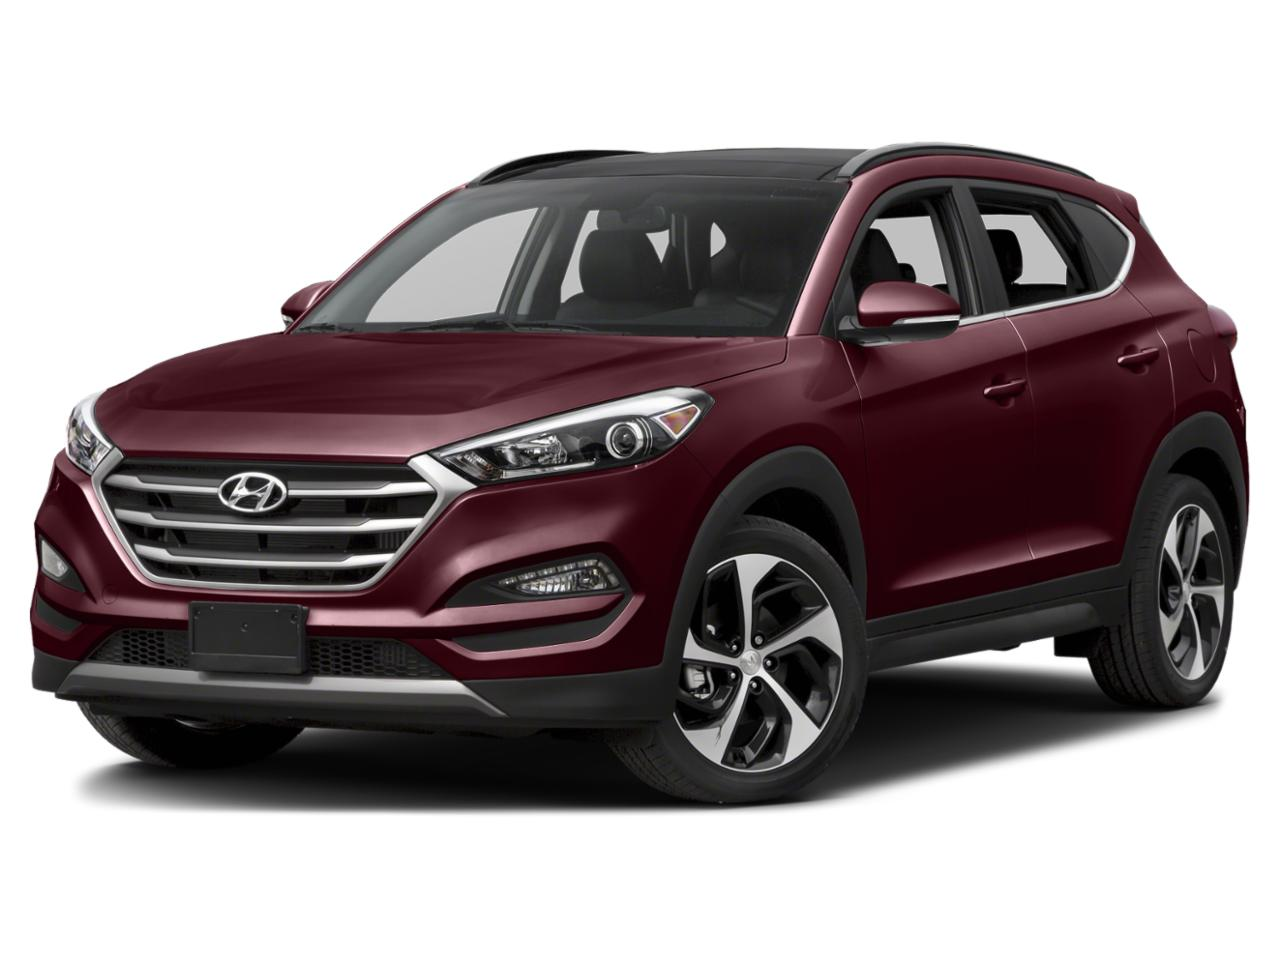 2018 Hyundai Tucson Vehicle Photo in Tulsa, OK 74133